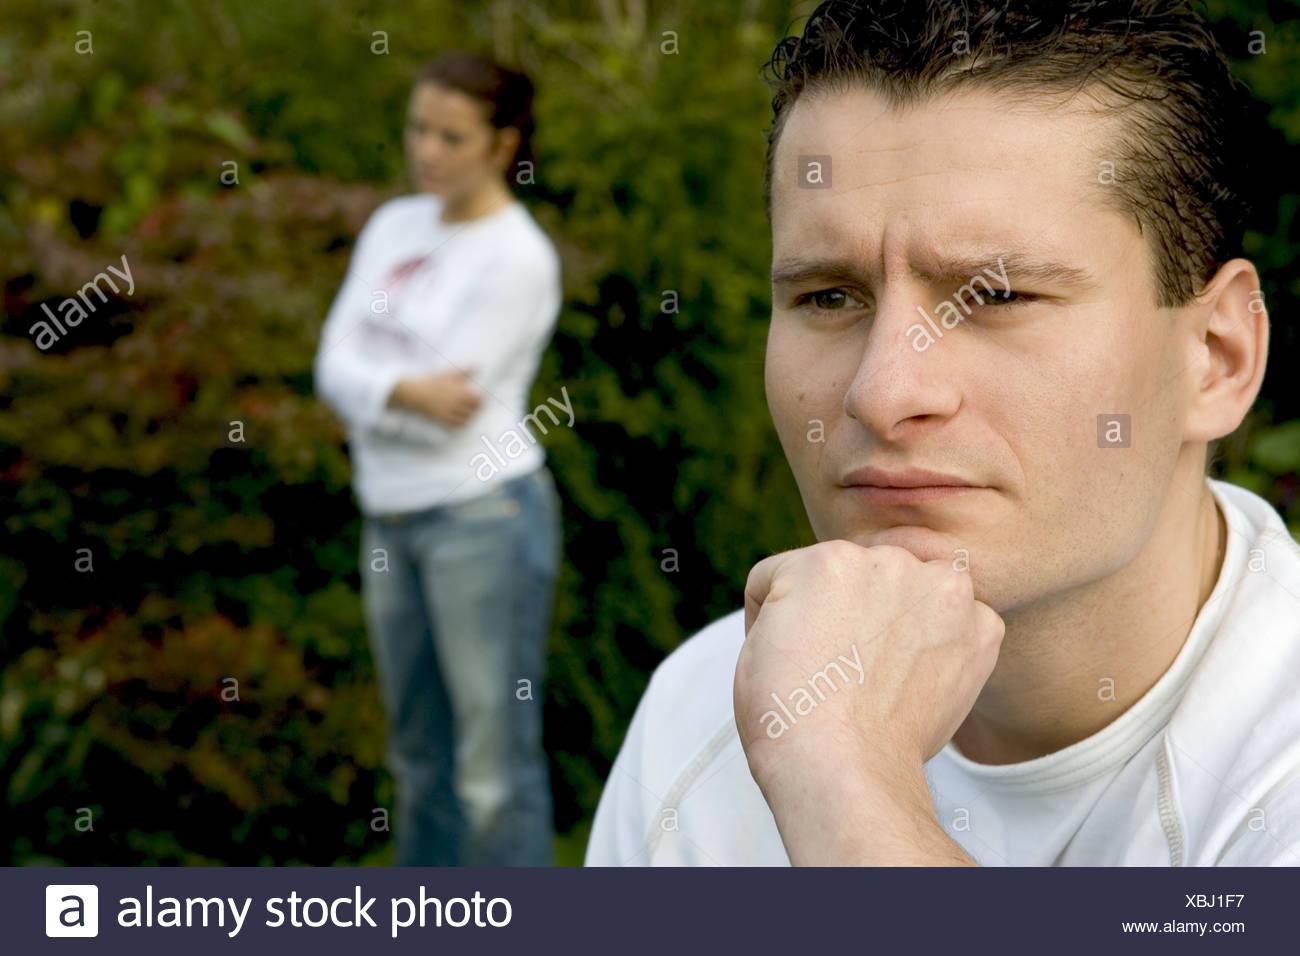 Matrimonio dificultades terco rostro femenino y masculino Imagen De Stock